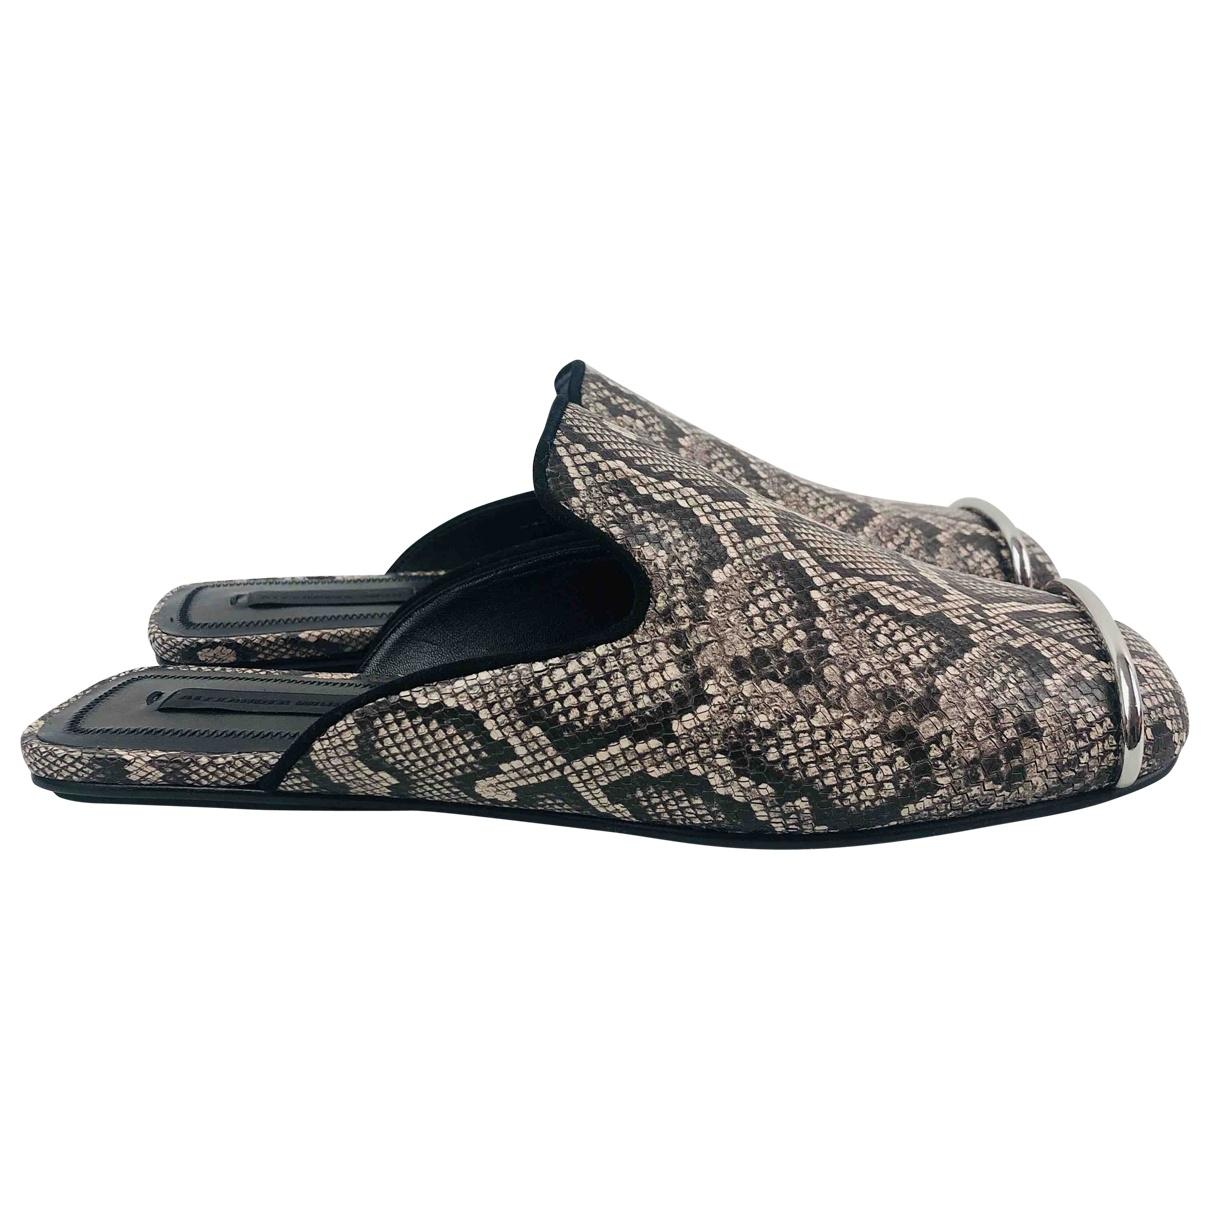 Alexander Wang \N Brown Leather Sandals for Women 36 EU